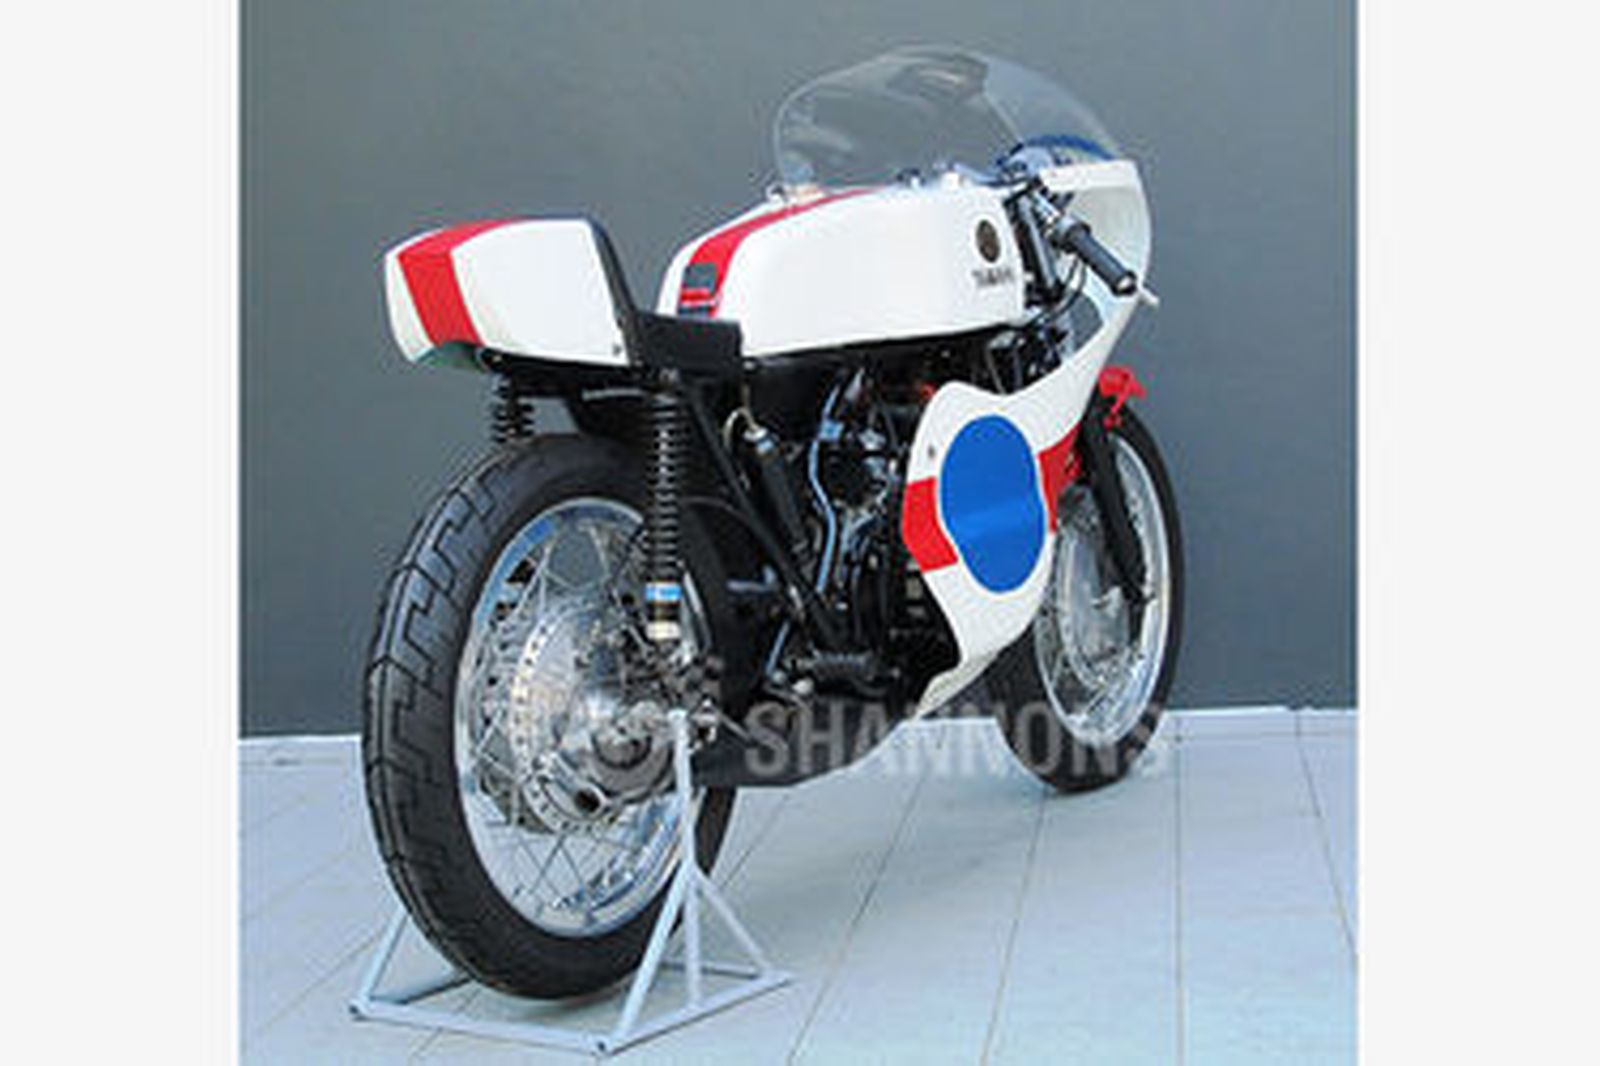 Yamaha TR3/TZ350 Production Racer